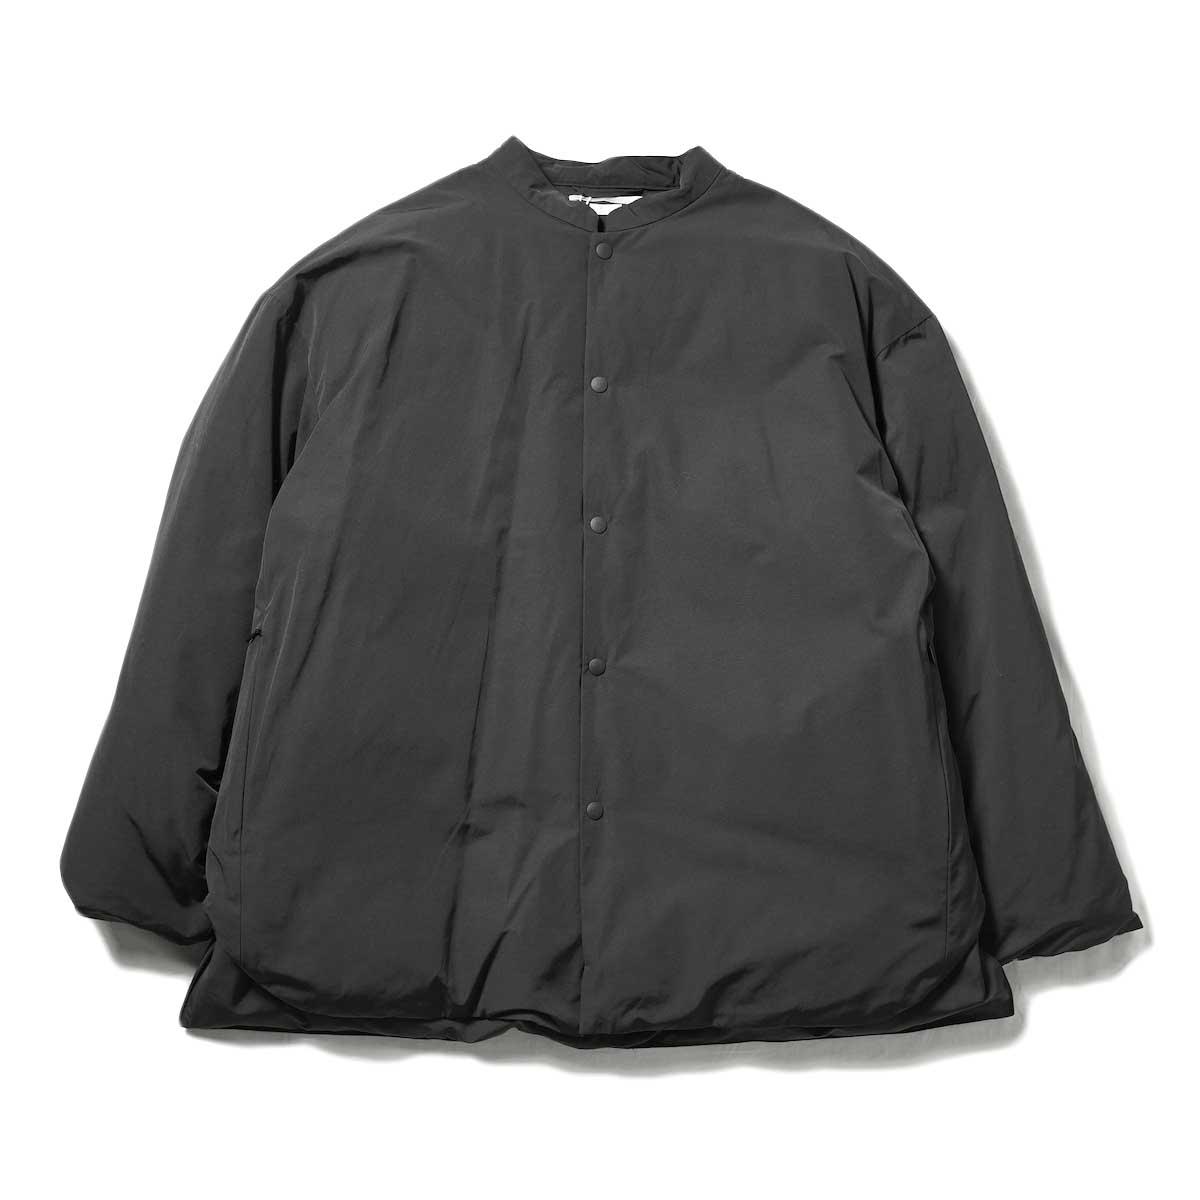 blurhms / Stand-up Collar Down Jacket (Black)